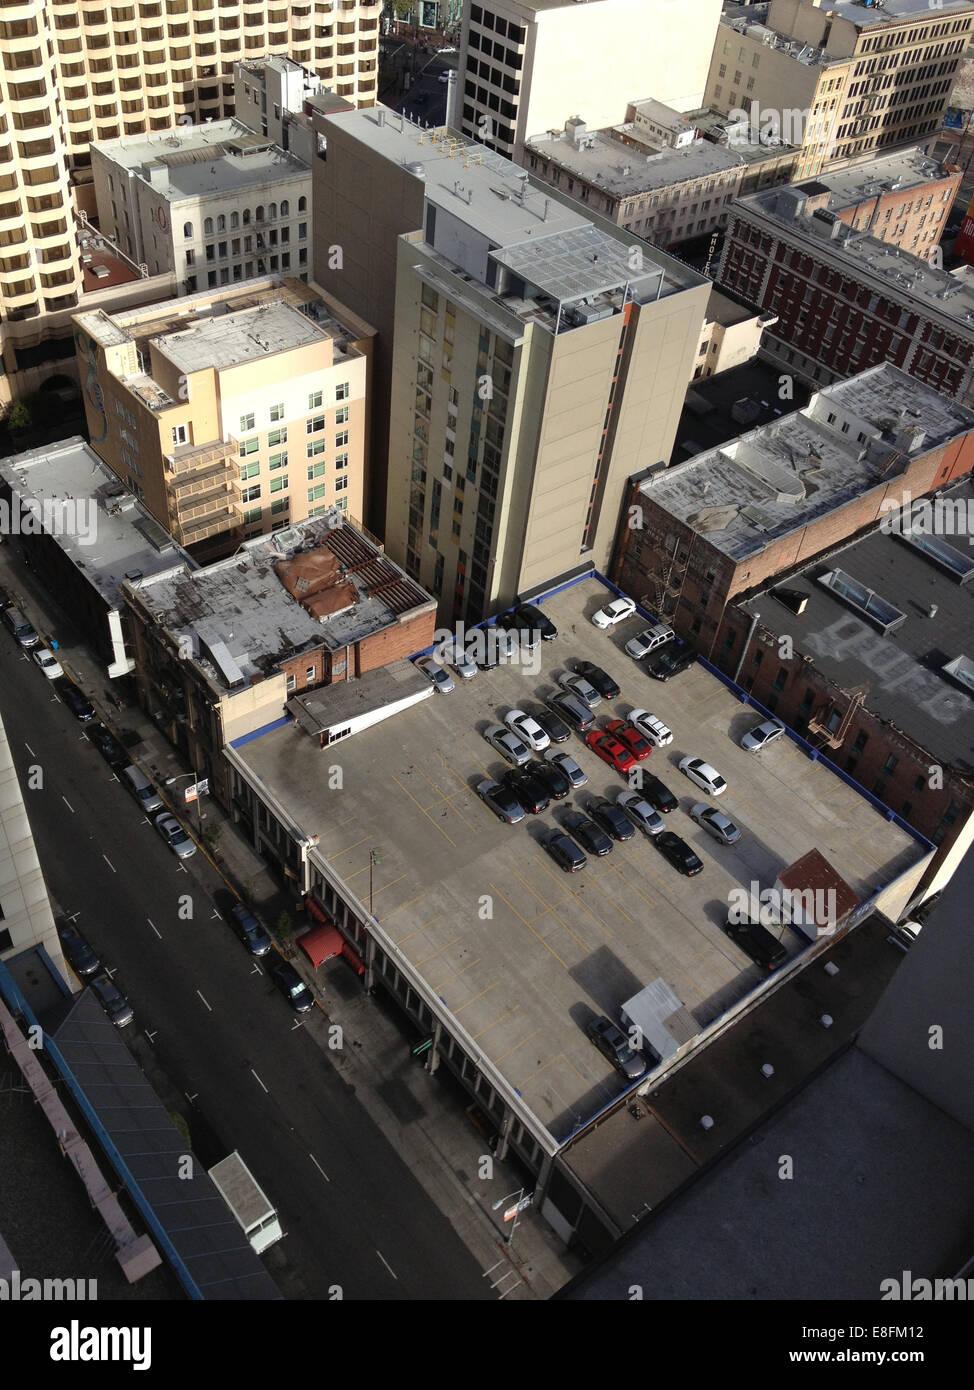 USA, California, San Francisco, Rooftop car park and city buildings - Stock Image